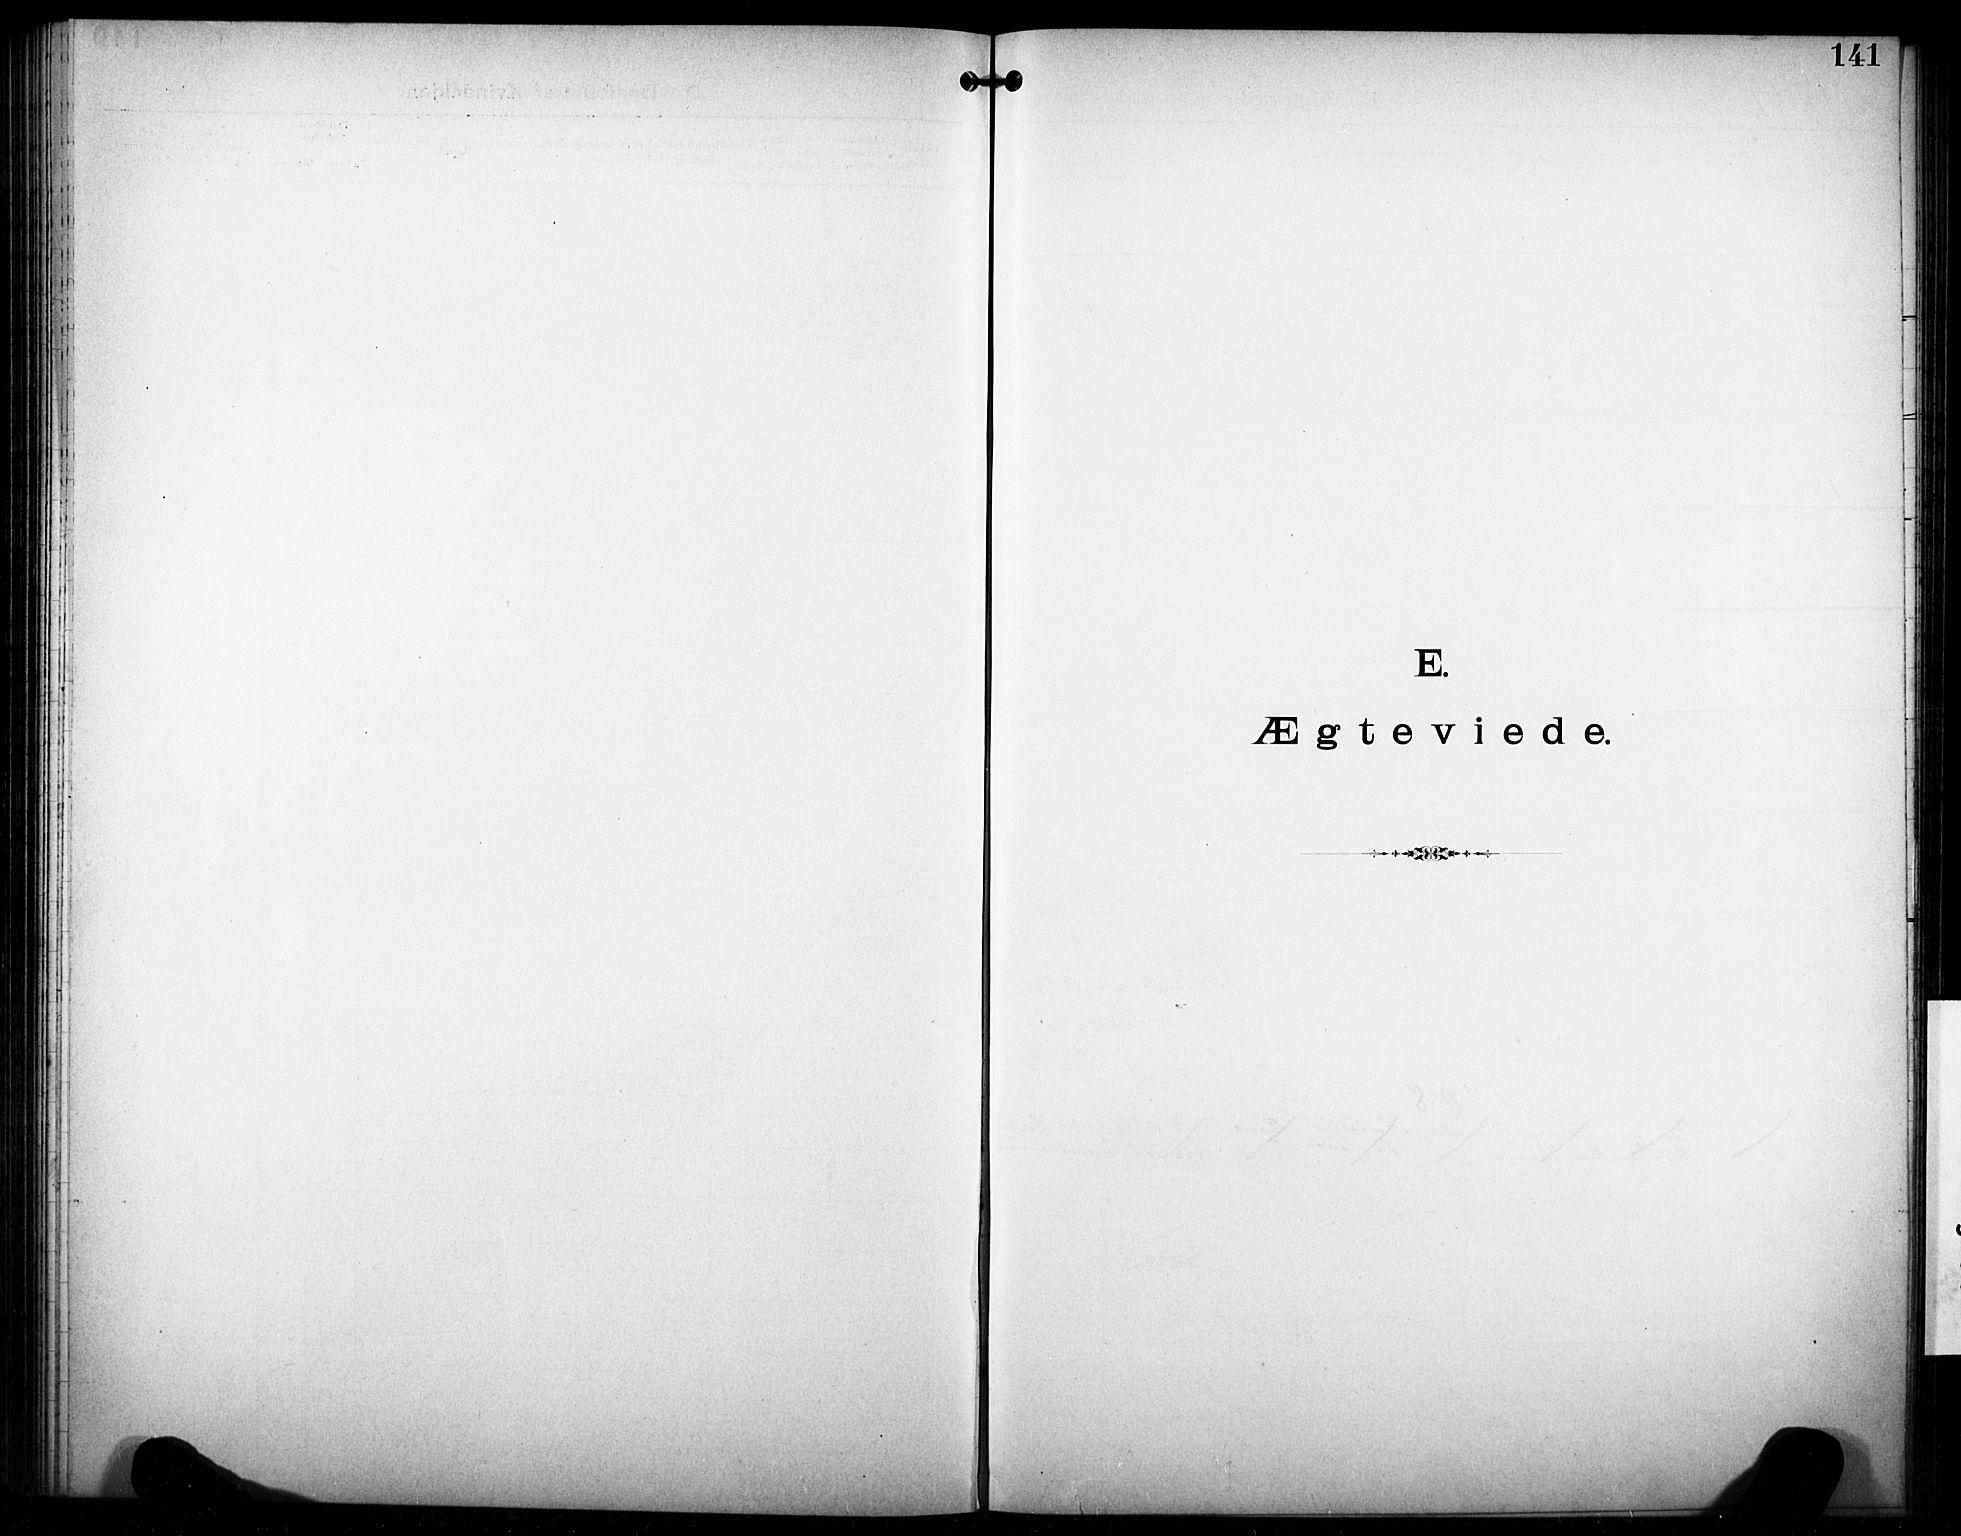 SAKO, Den katolsk-apostoliske menighet i Larvik, F/Fa/L0001: Dissenterprotokoll nr. 1, 1892-1933, s. 141